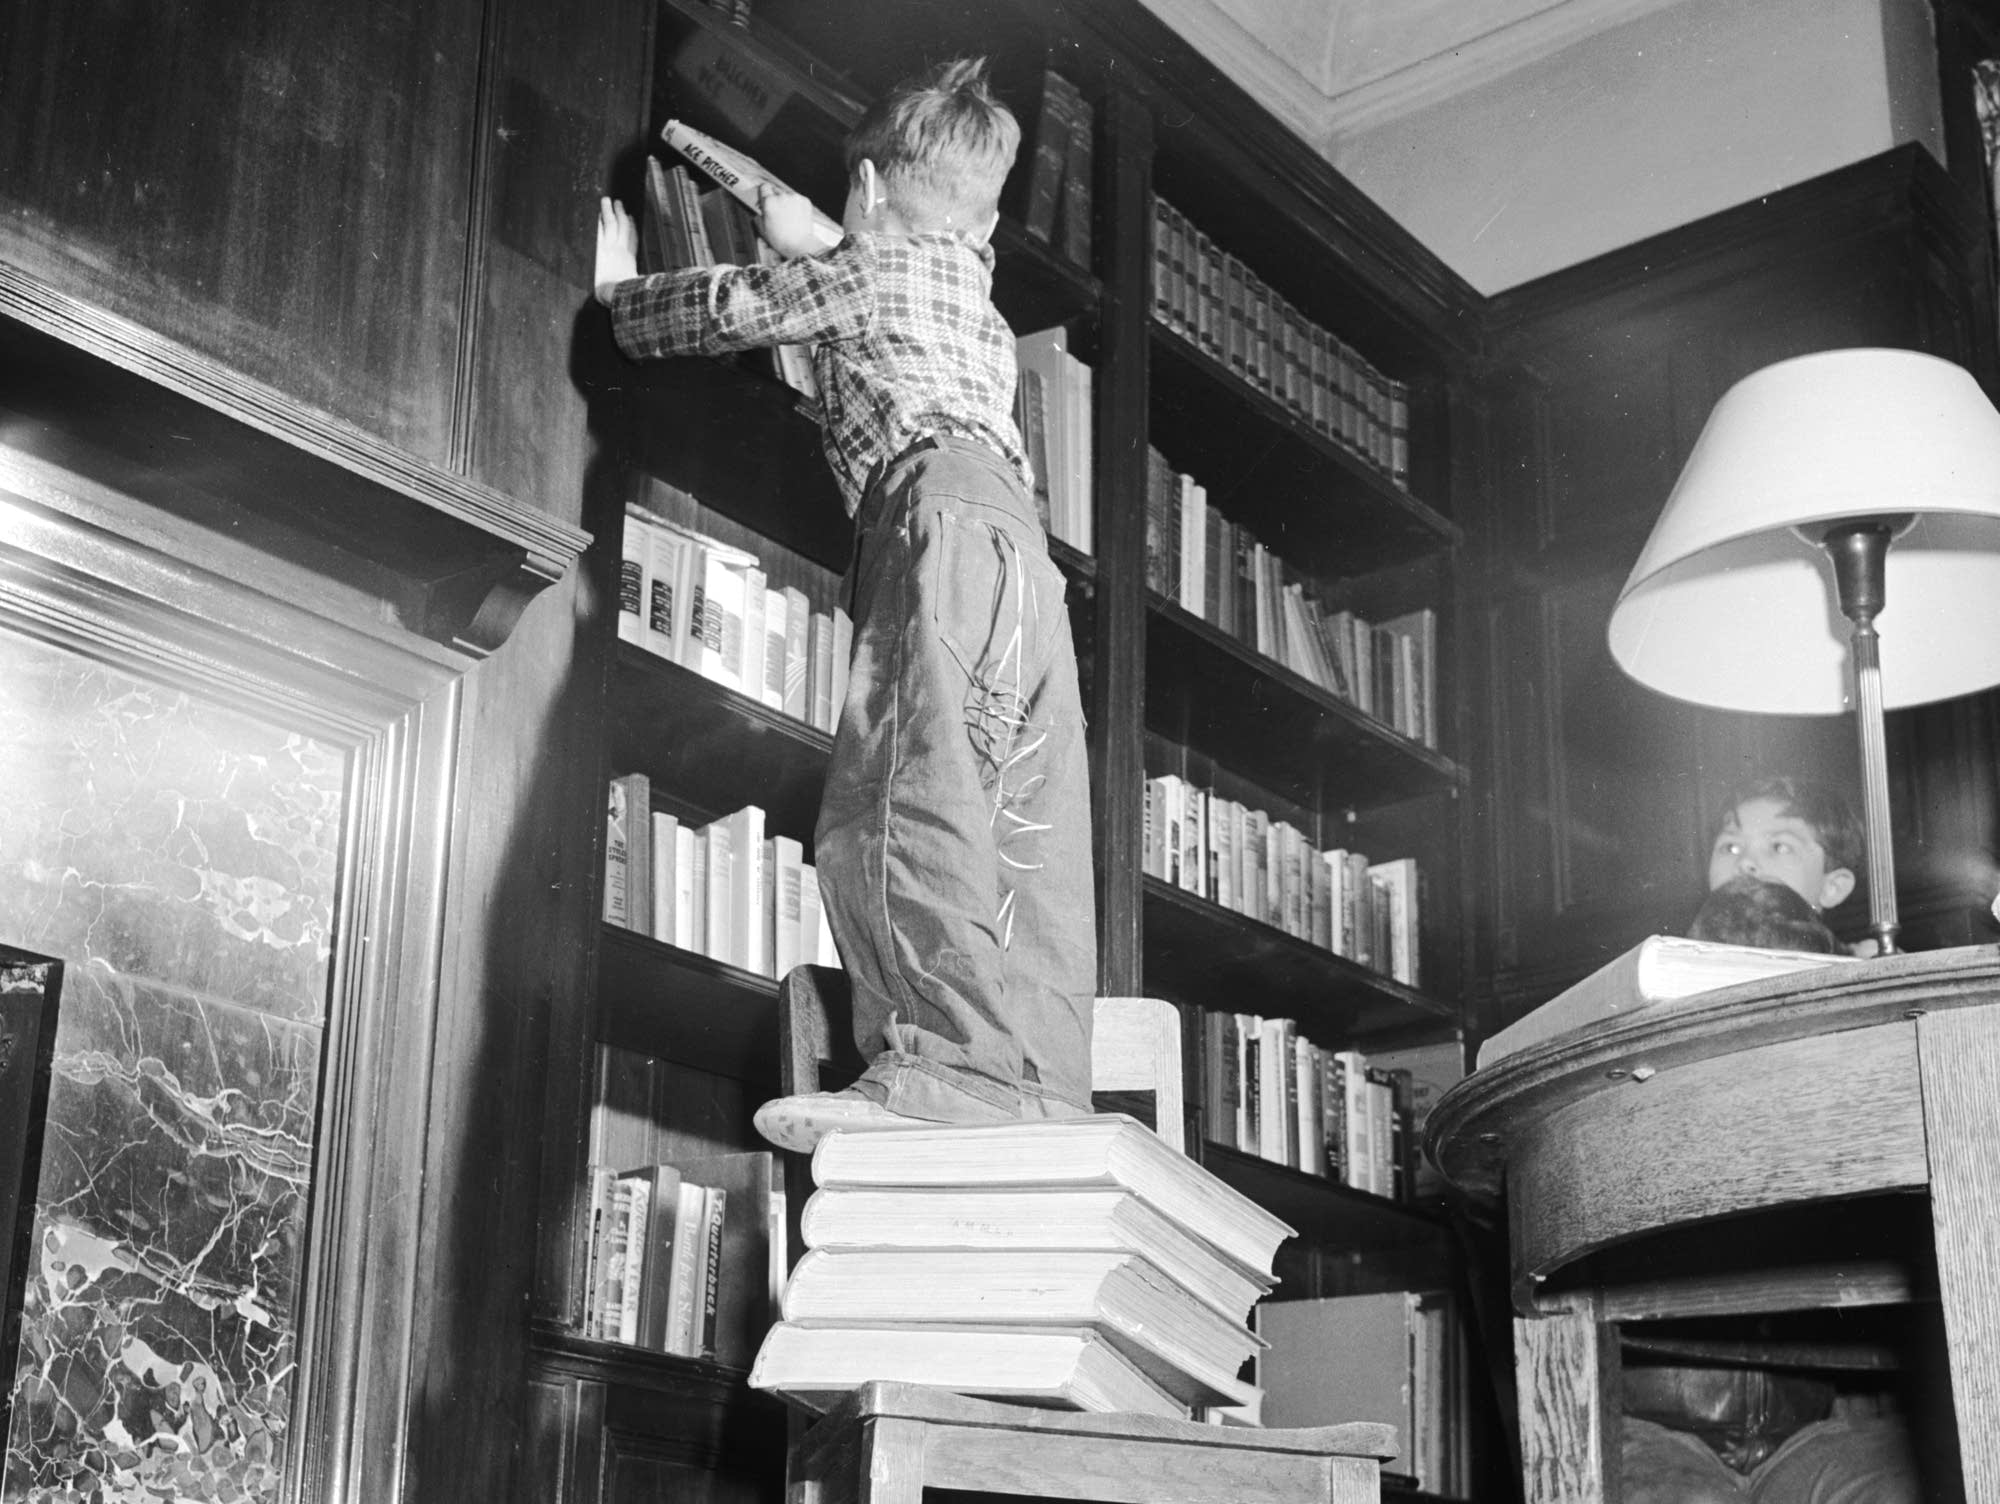 Pile of books, circa 1955